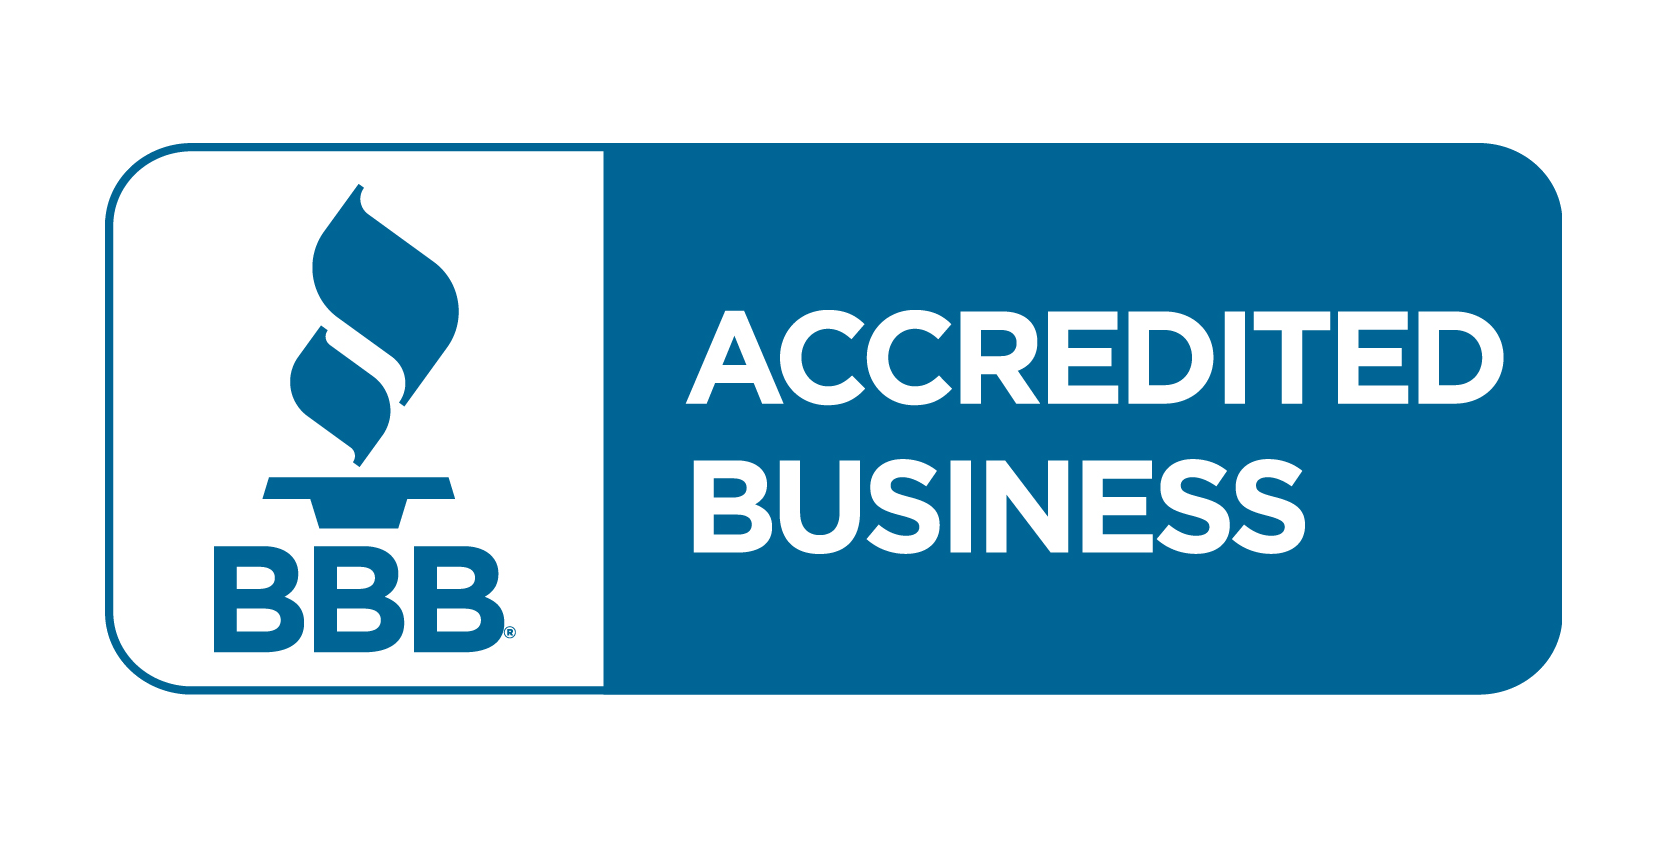 Better Business Bureau A+ Rated Company